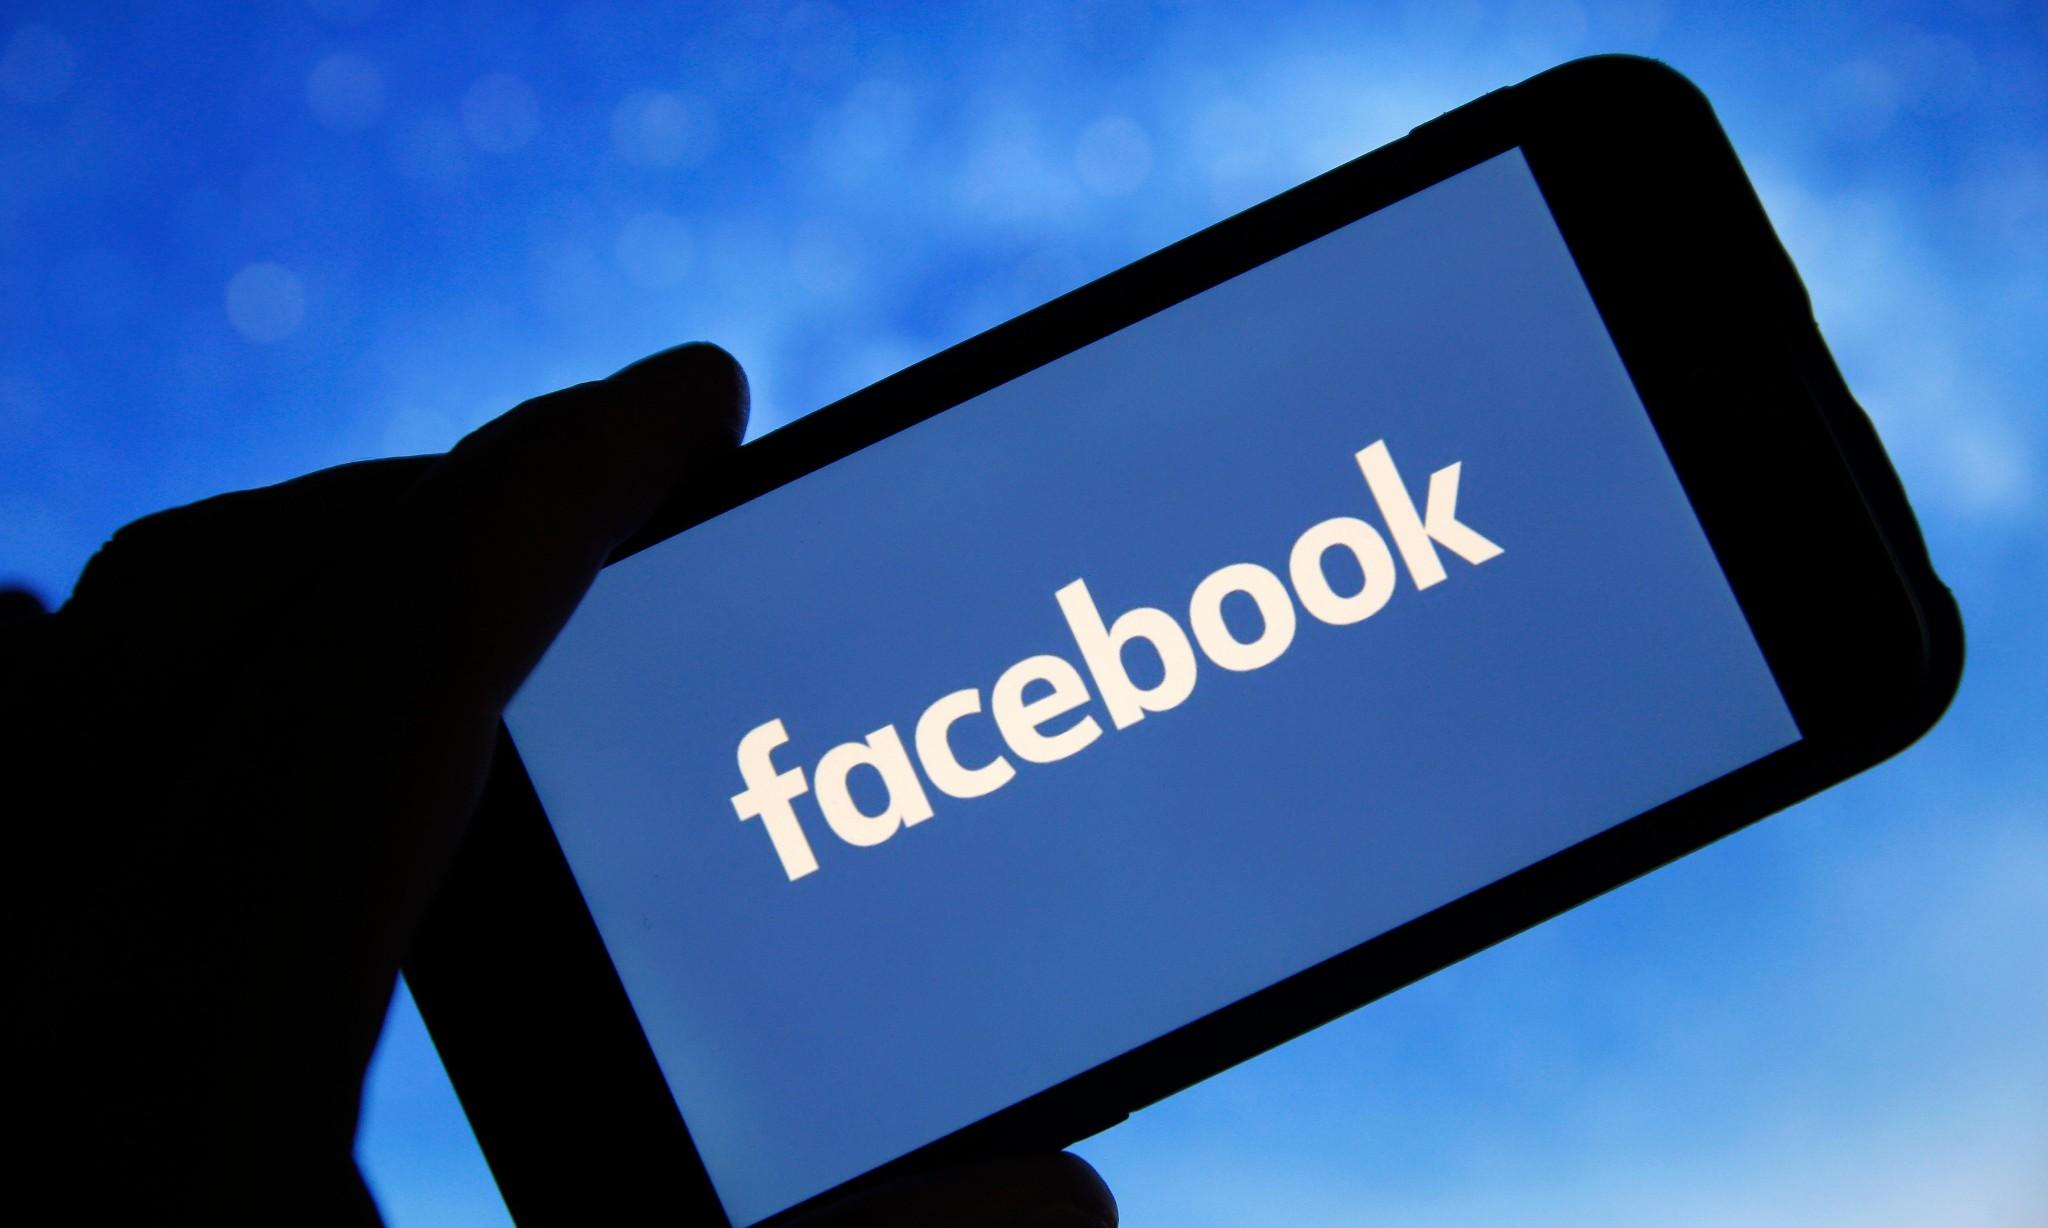 Entrepreneurs, Social Media & Blogging - cover